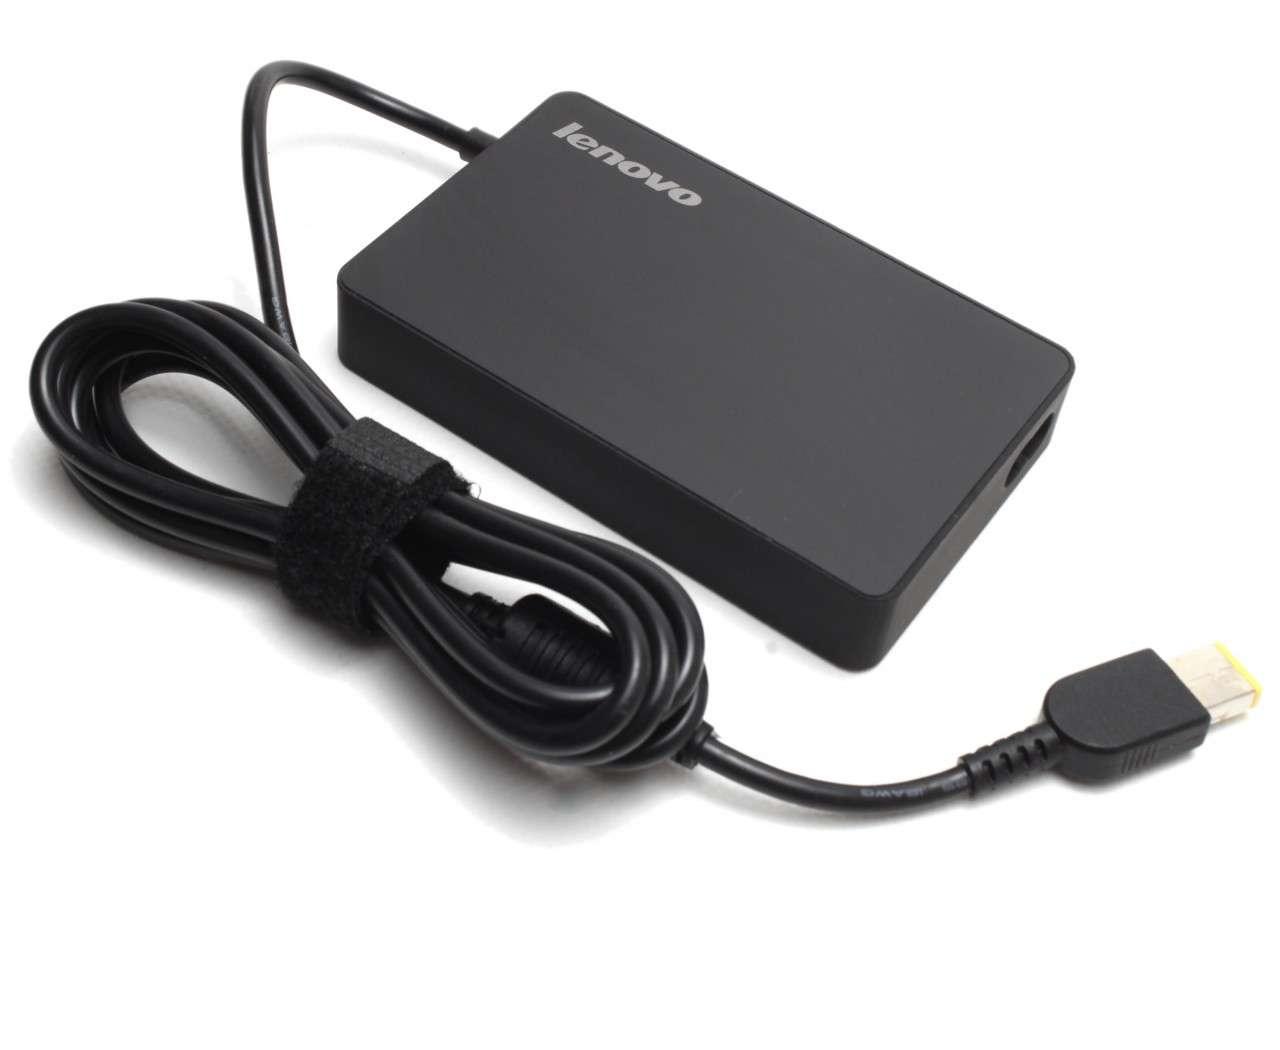 Incarcator Lenovo G505s 65W imagine powerlaptop.ro 2021